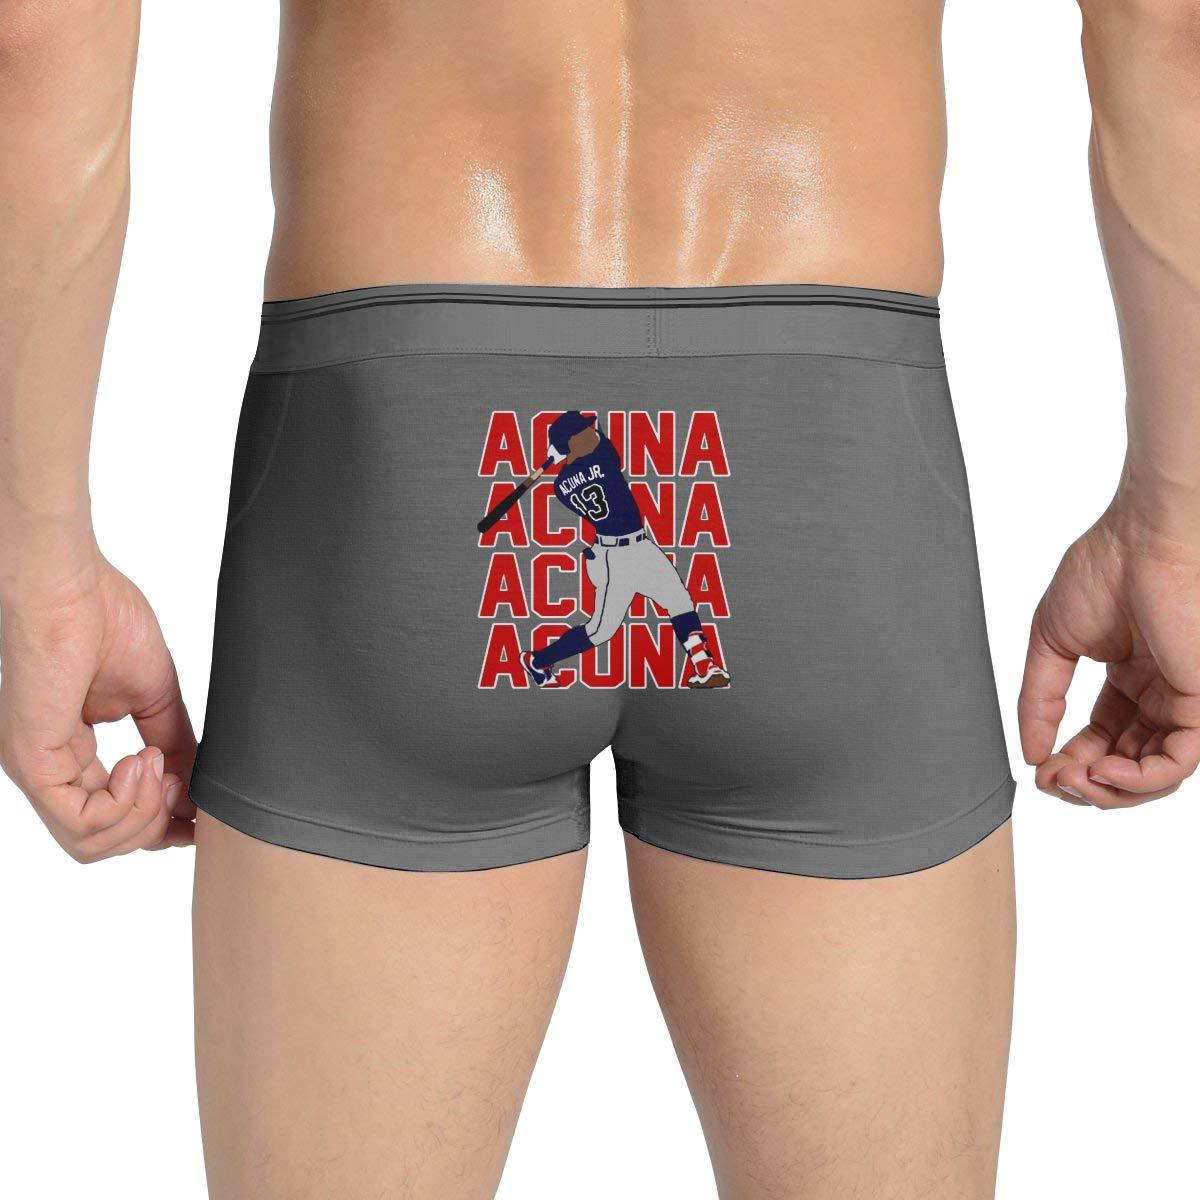 Moore Me Mens Ultra Soft Boxer Briefs Atlanta Acuna Text Pic Comfortable Underwear